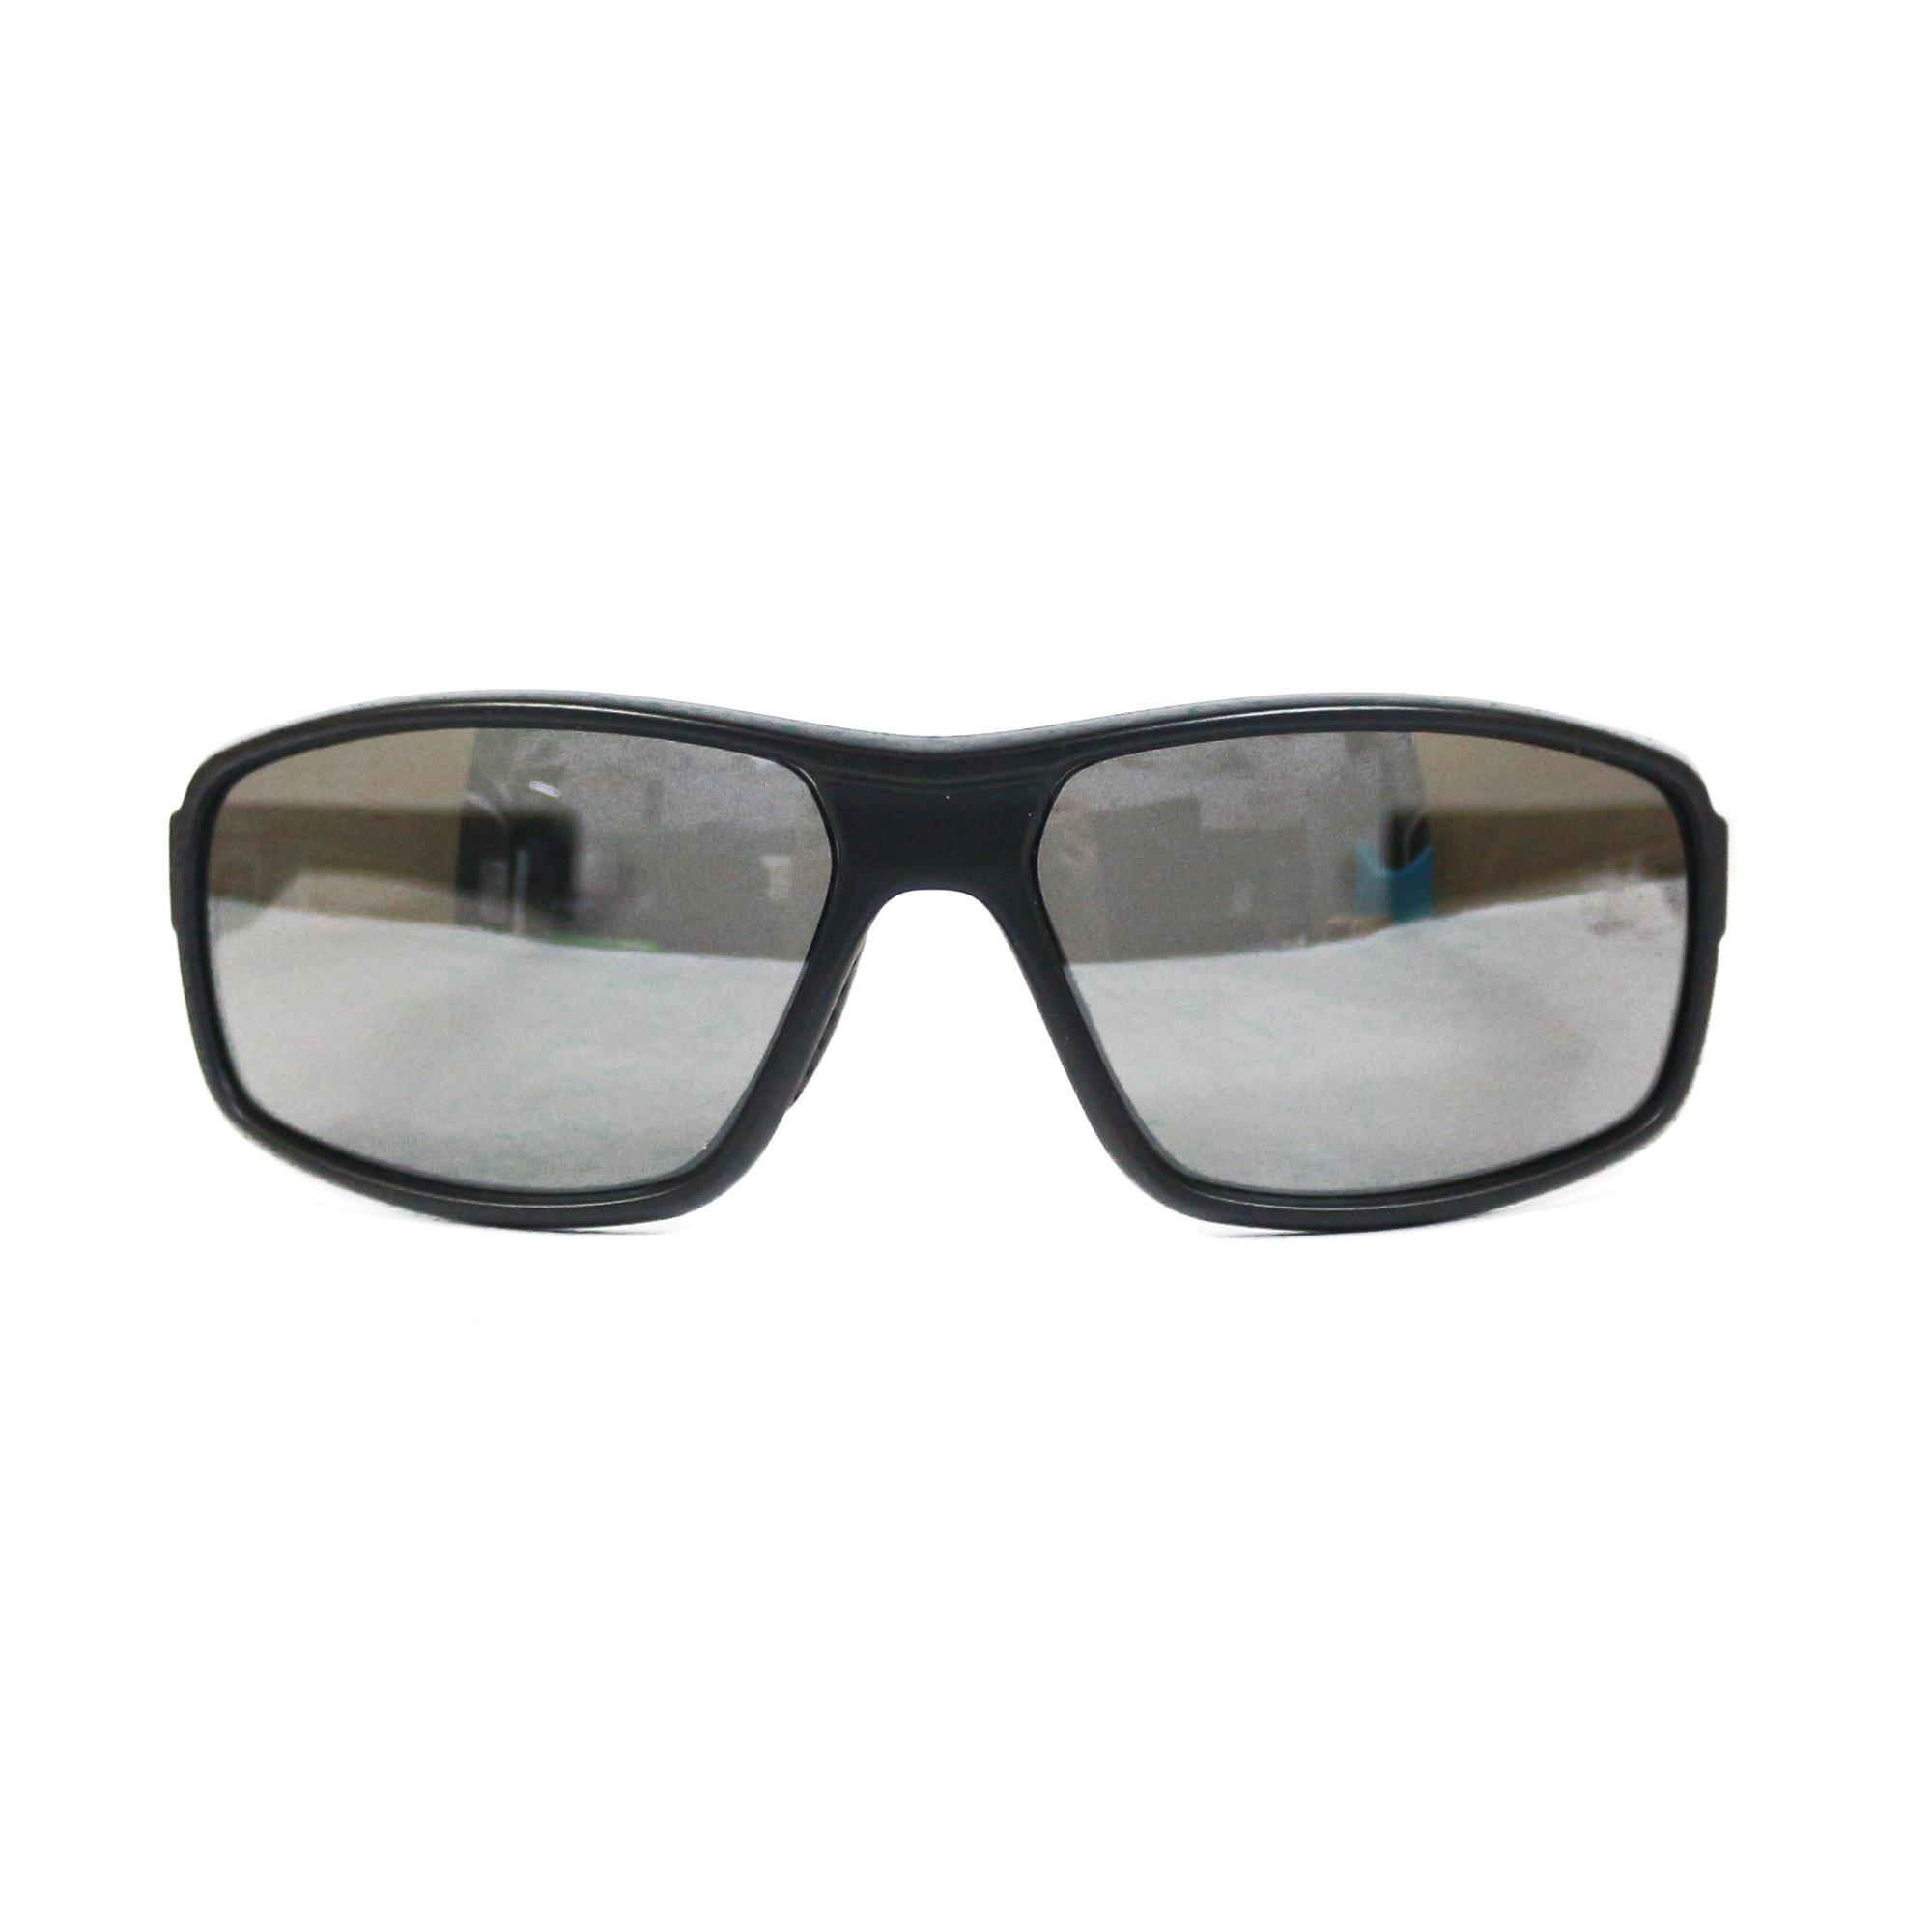 Zeque Polarised Fishing Sunglasses Bunny Walk BW-0201M Blk /Real Tree (1188)